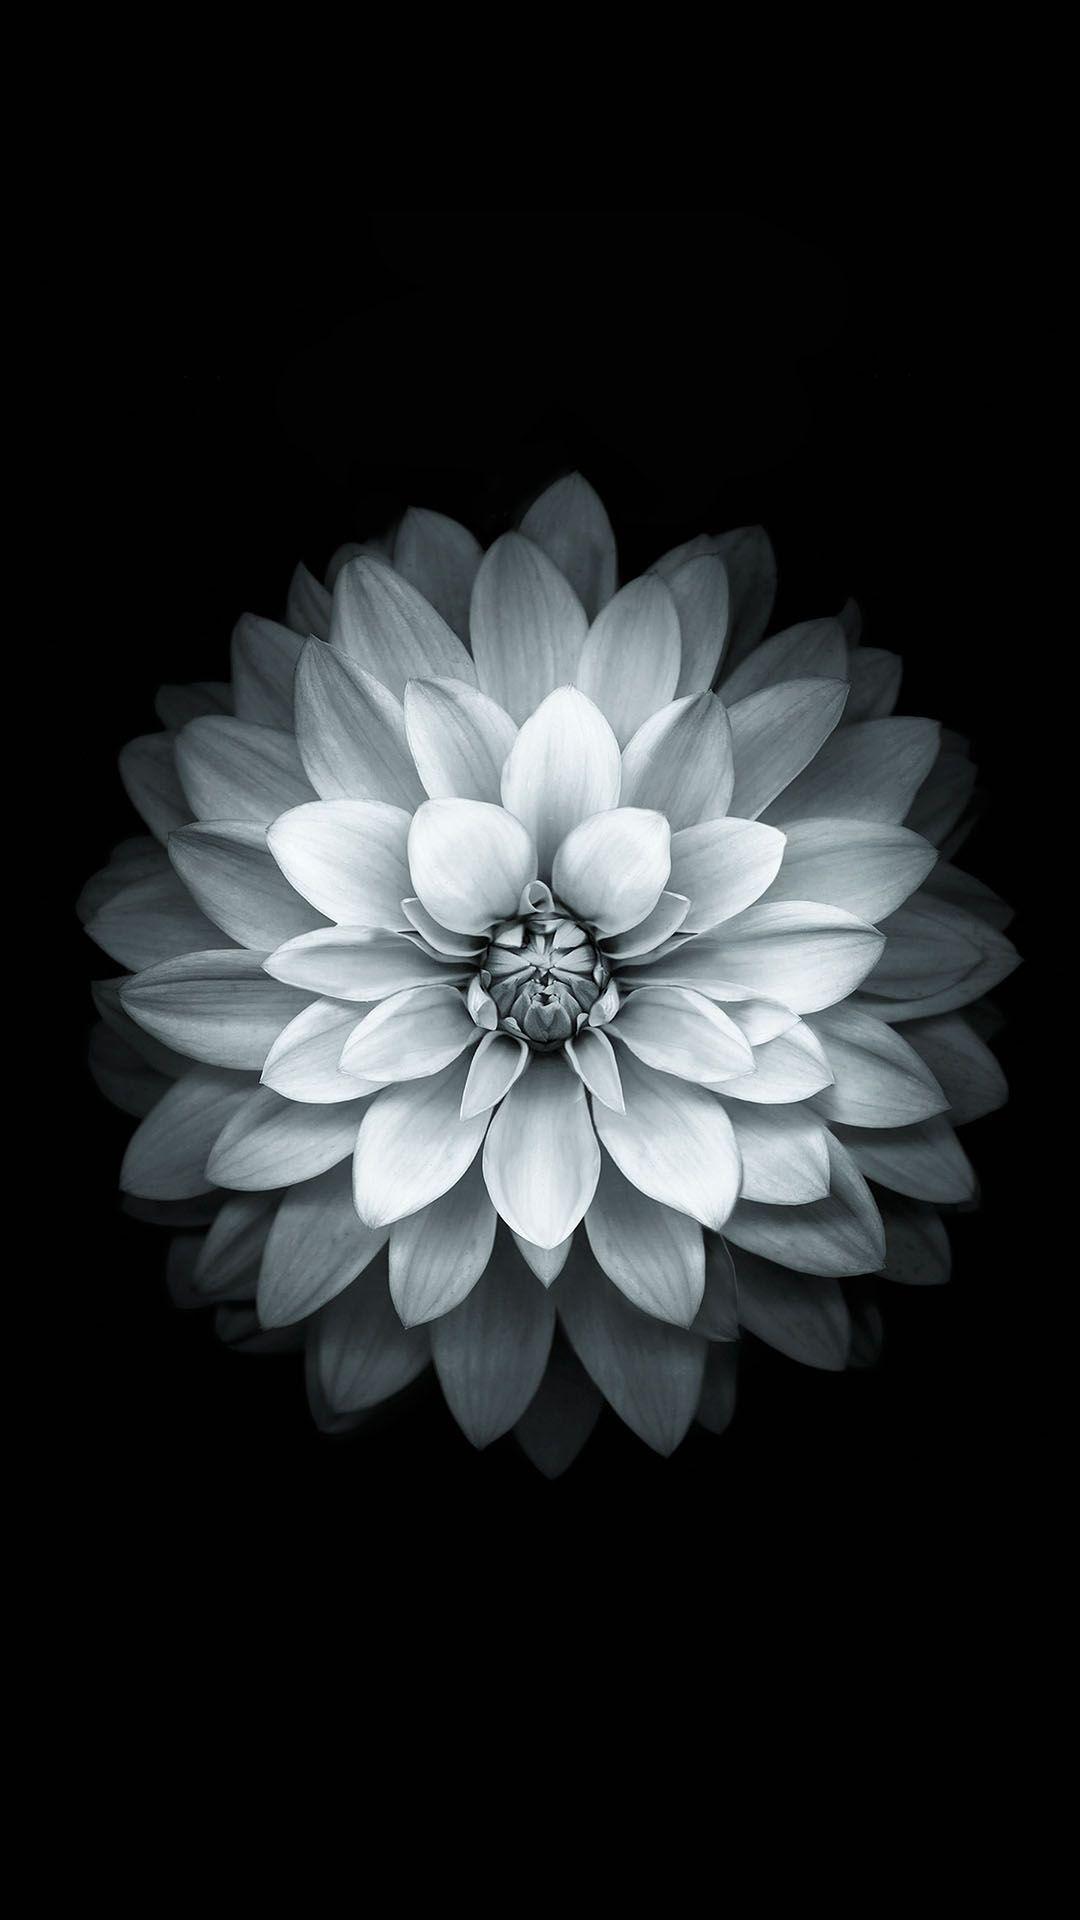 Black And White Flower Samsung Galaxy wallpaper